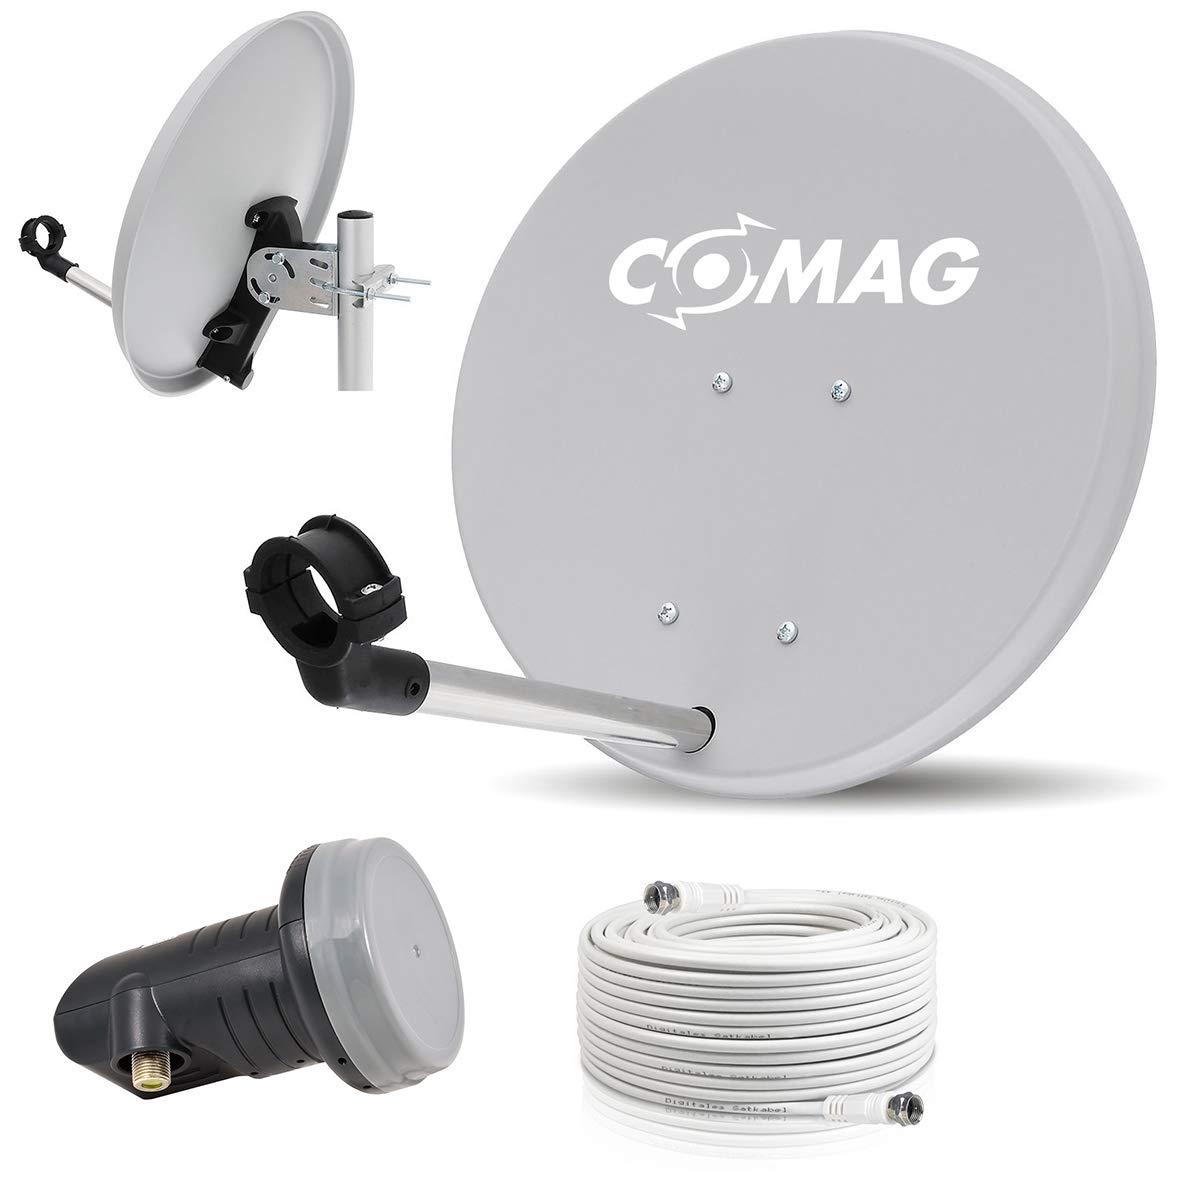 Digitale Camping Sat Anlage Spiegel 40 cm Single LNB 0, 1 dB + Koaxialkabel 10m Kabel Balkon Caravan Mobil Schü ssel Antenne OPTICUM fü r HDTV HD Sky 3D 4K geeignet visiamo